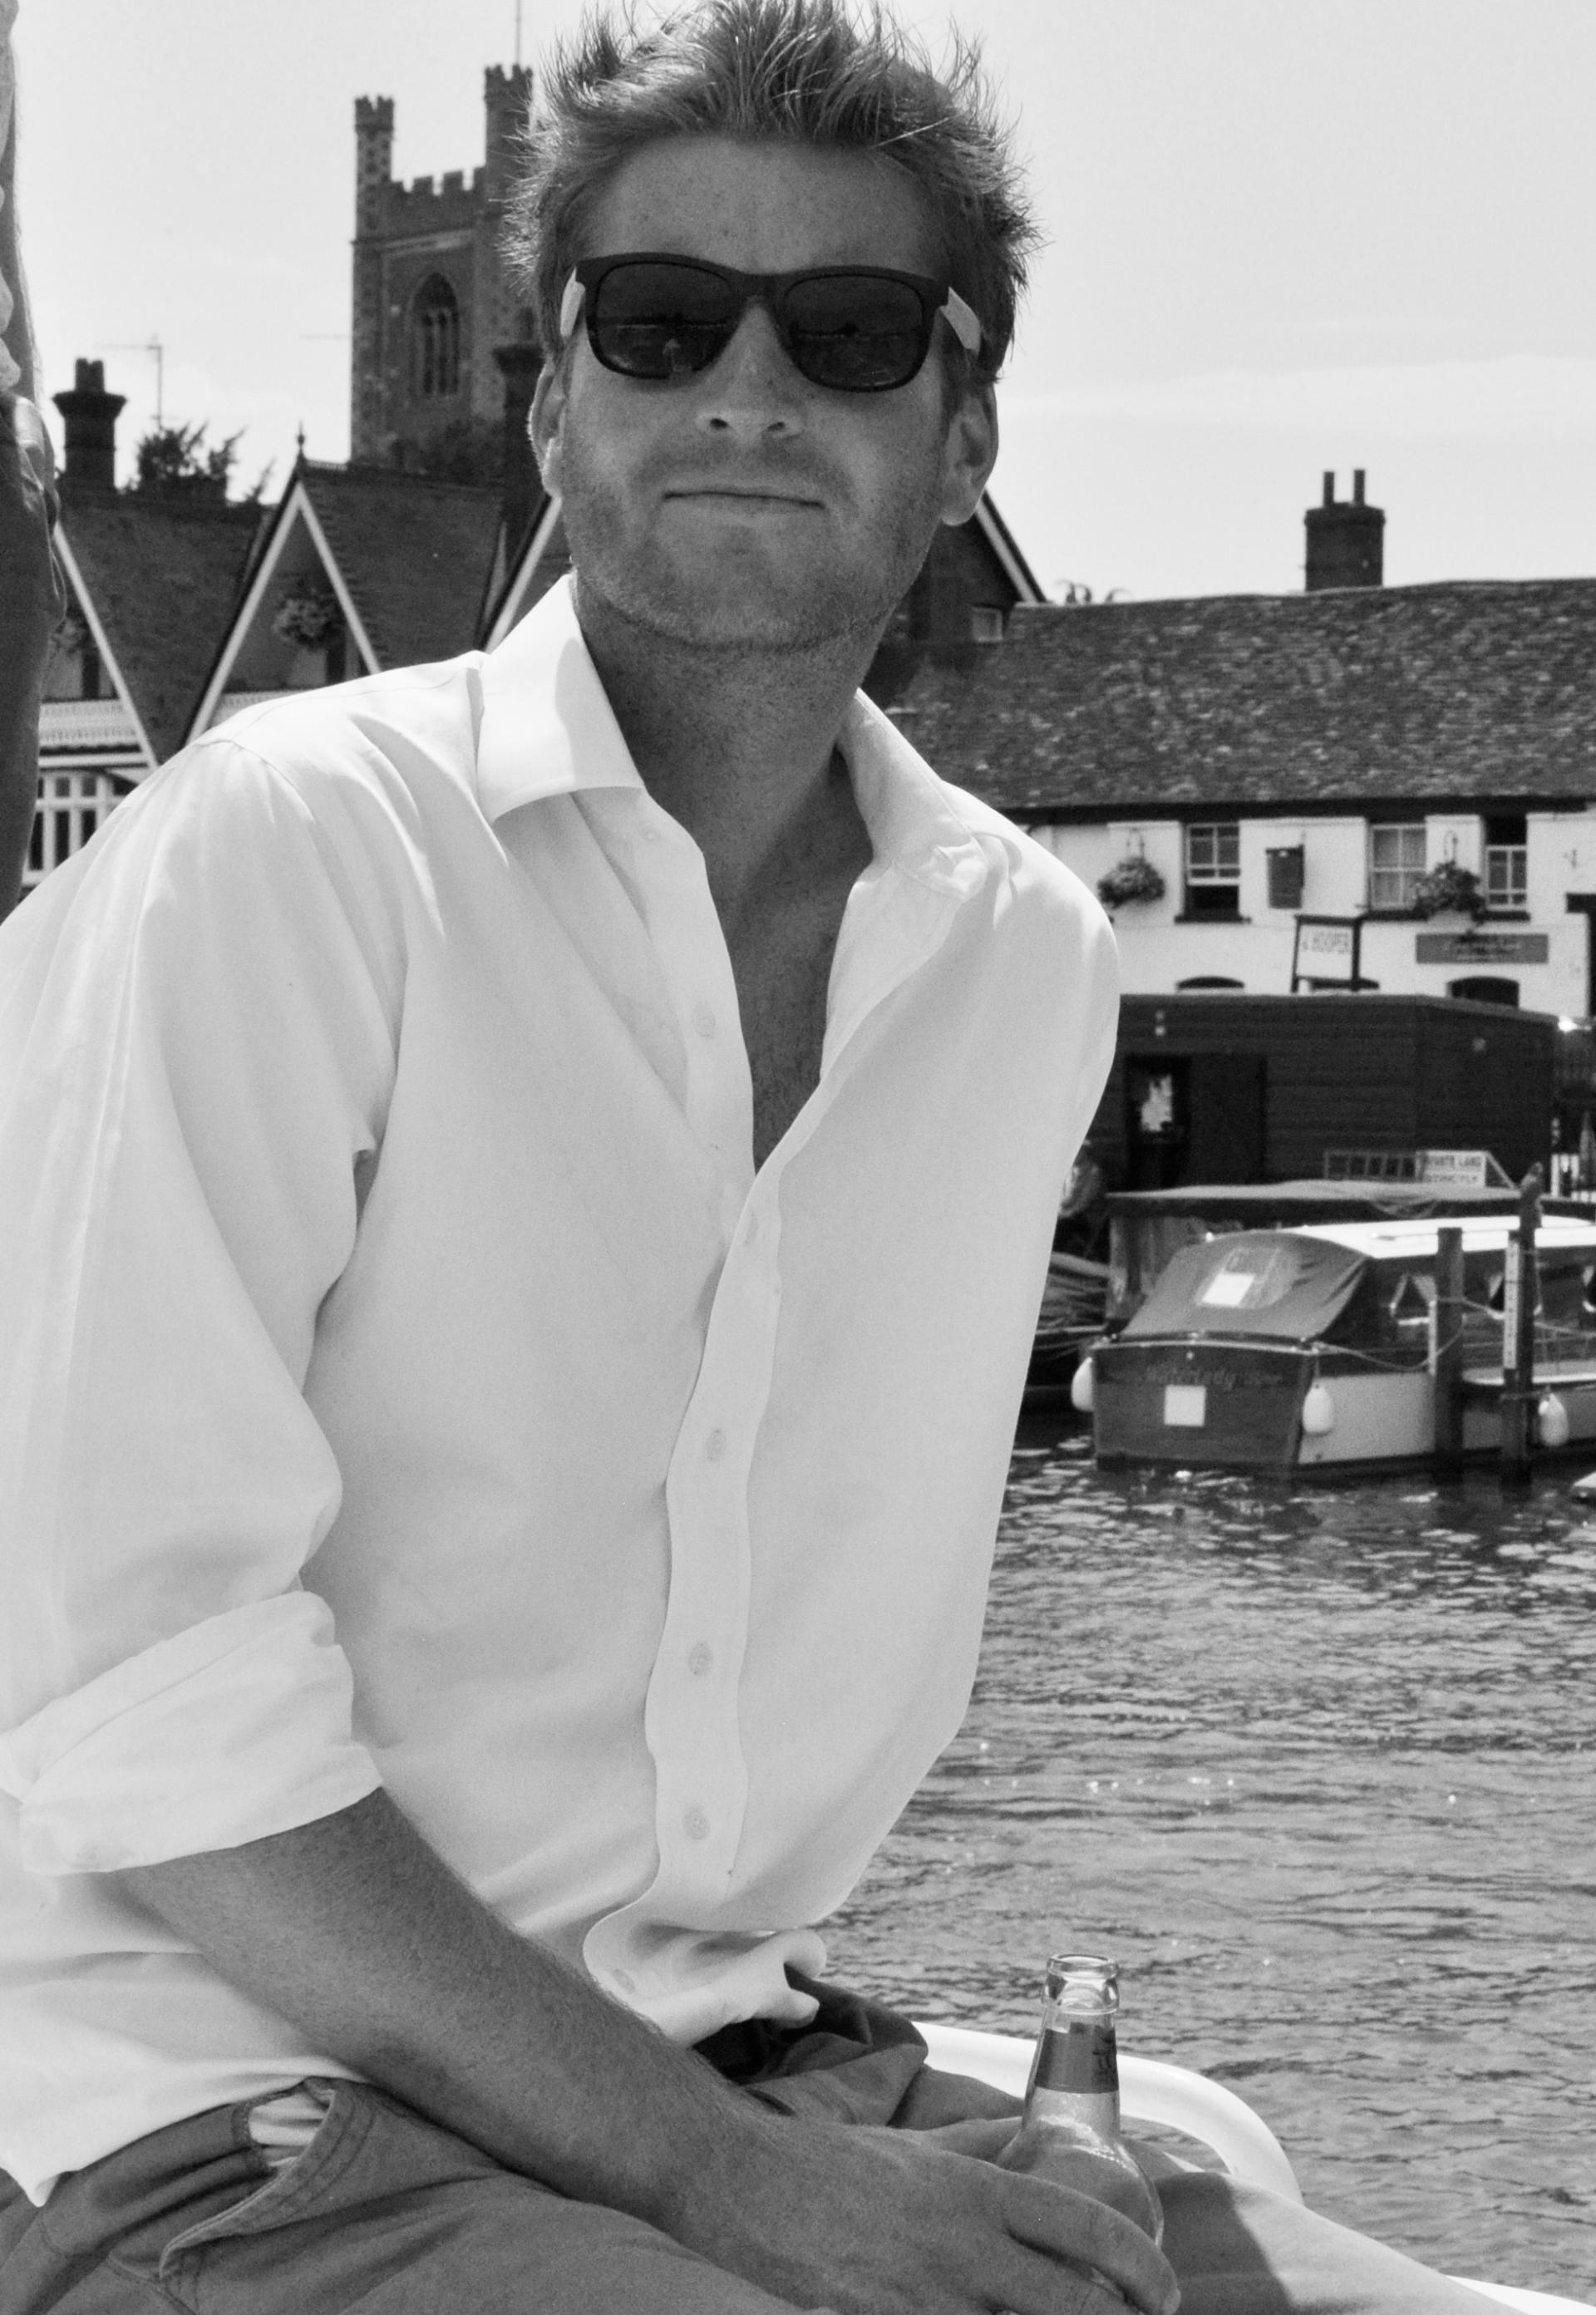 Sam White in sunglasses and shirt